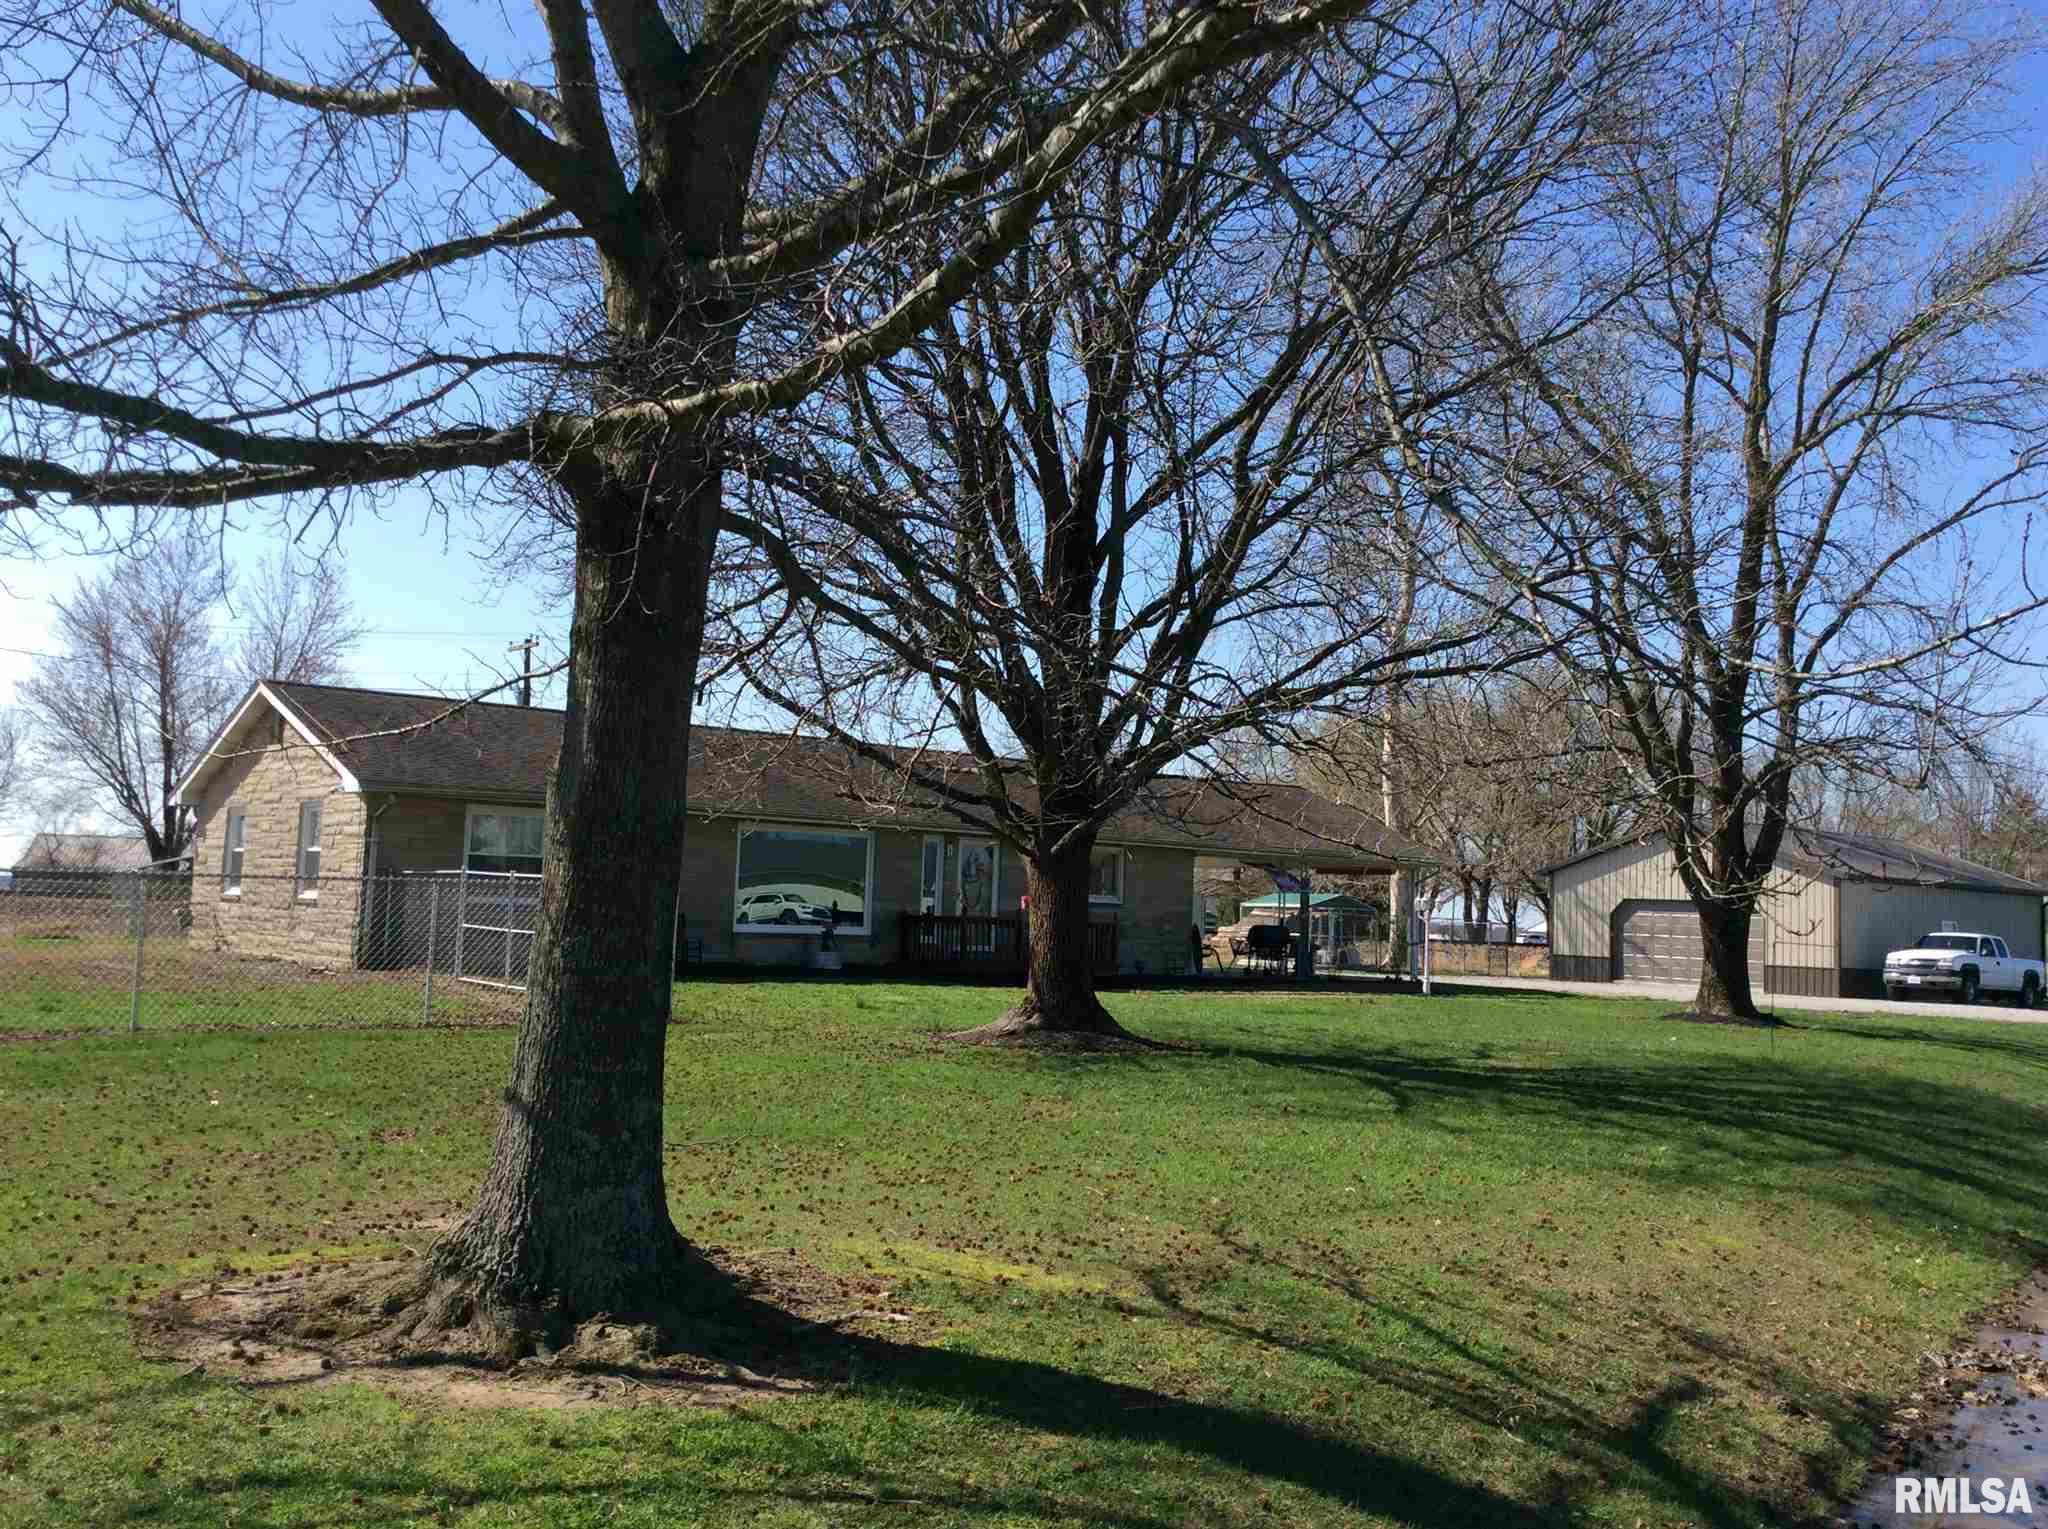 1363 W ROBINSON Property Photo - Wayne City, IL real estate listing